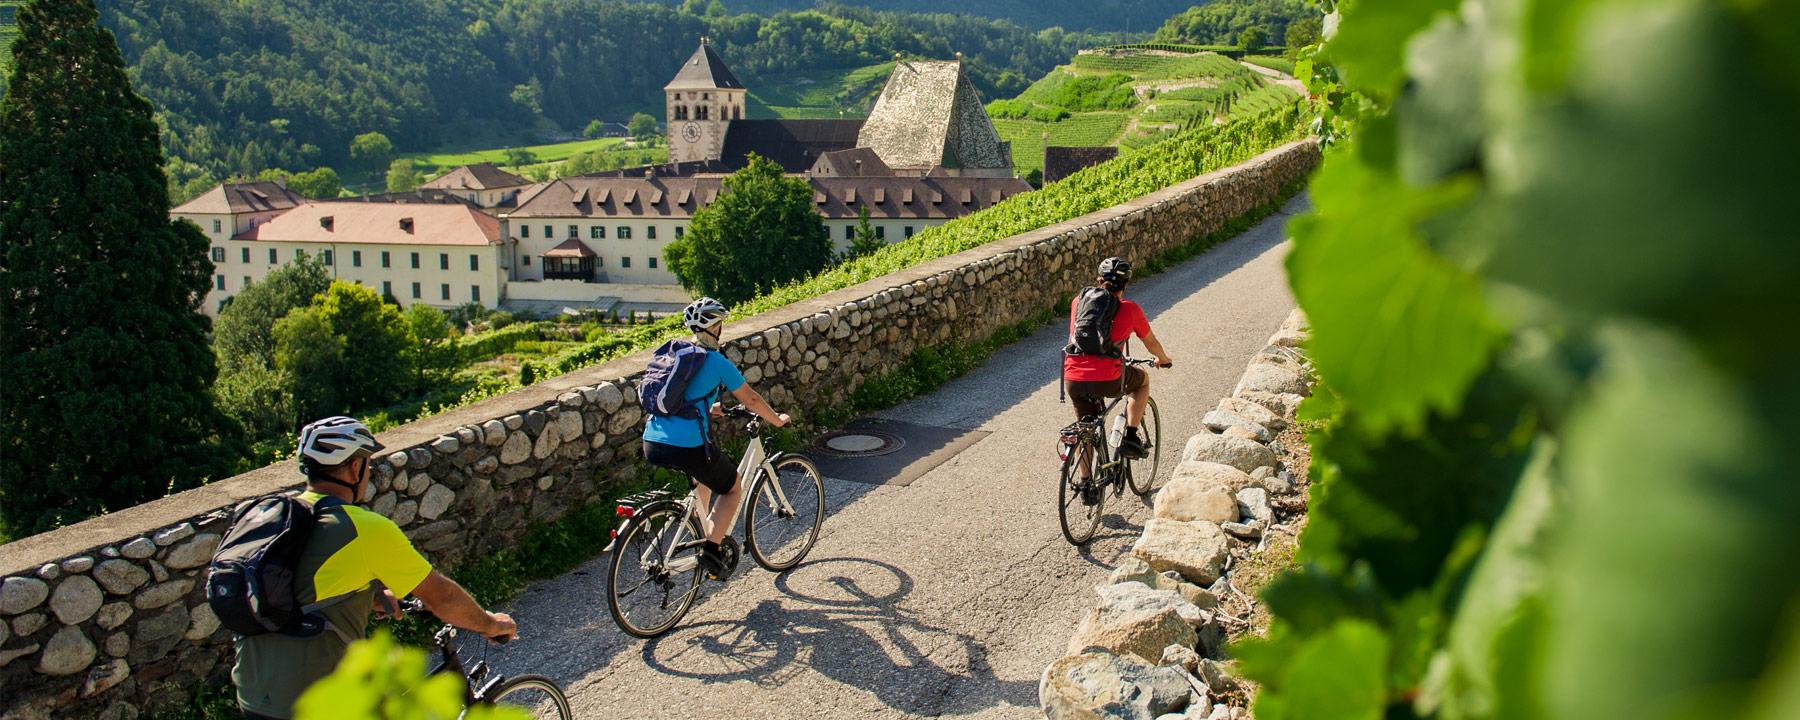 Talradfahren in Südtirol im Frühling